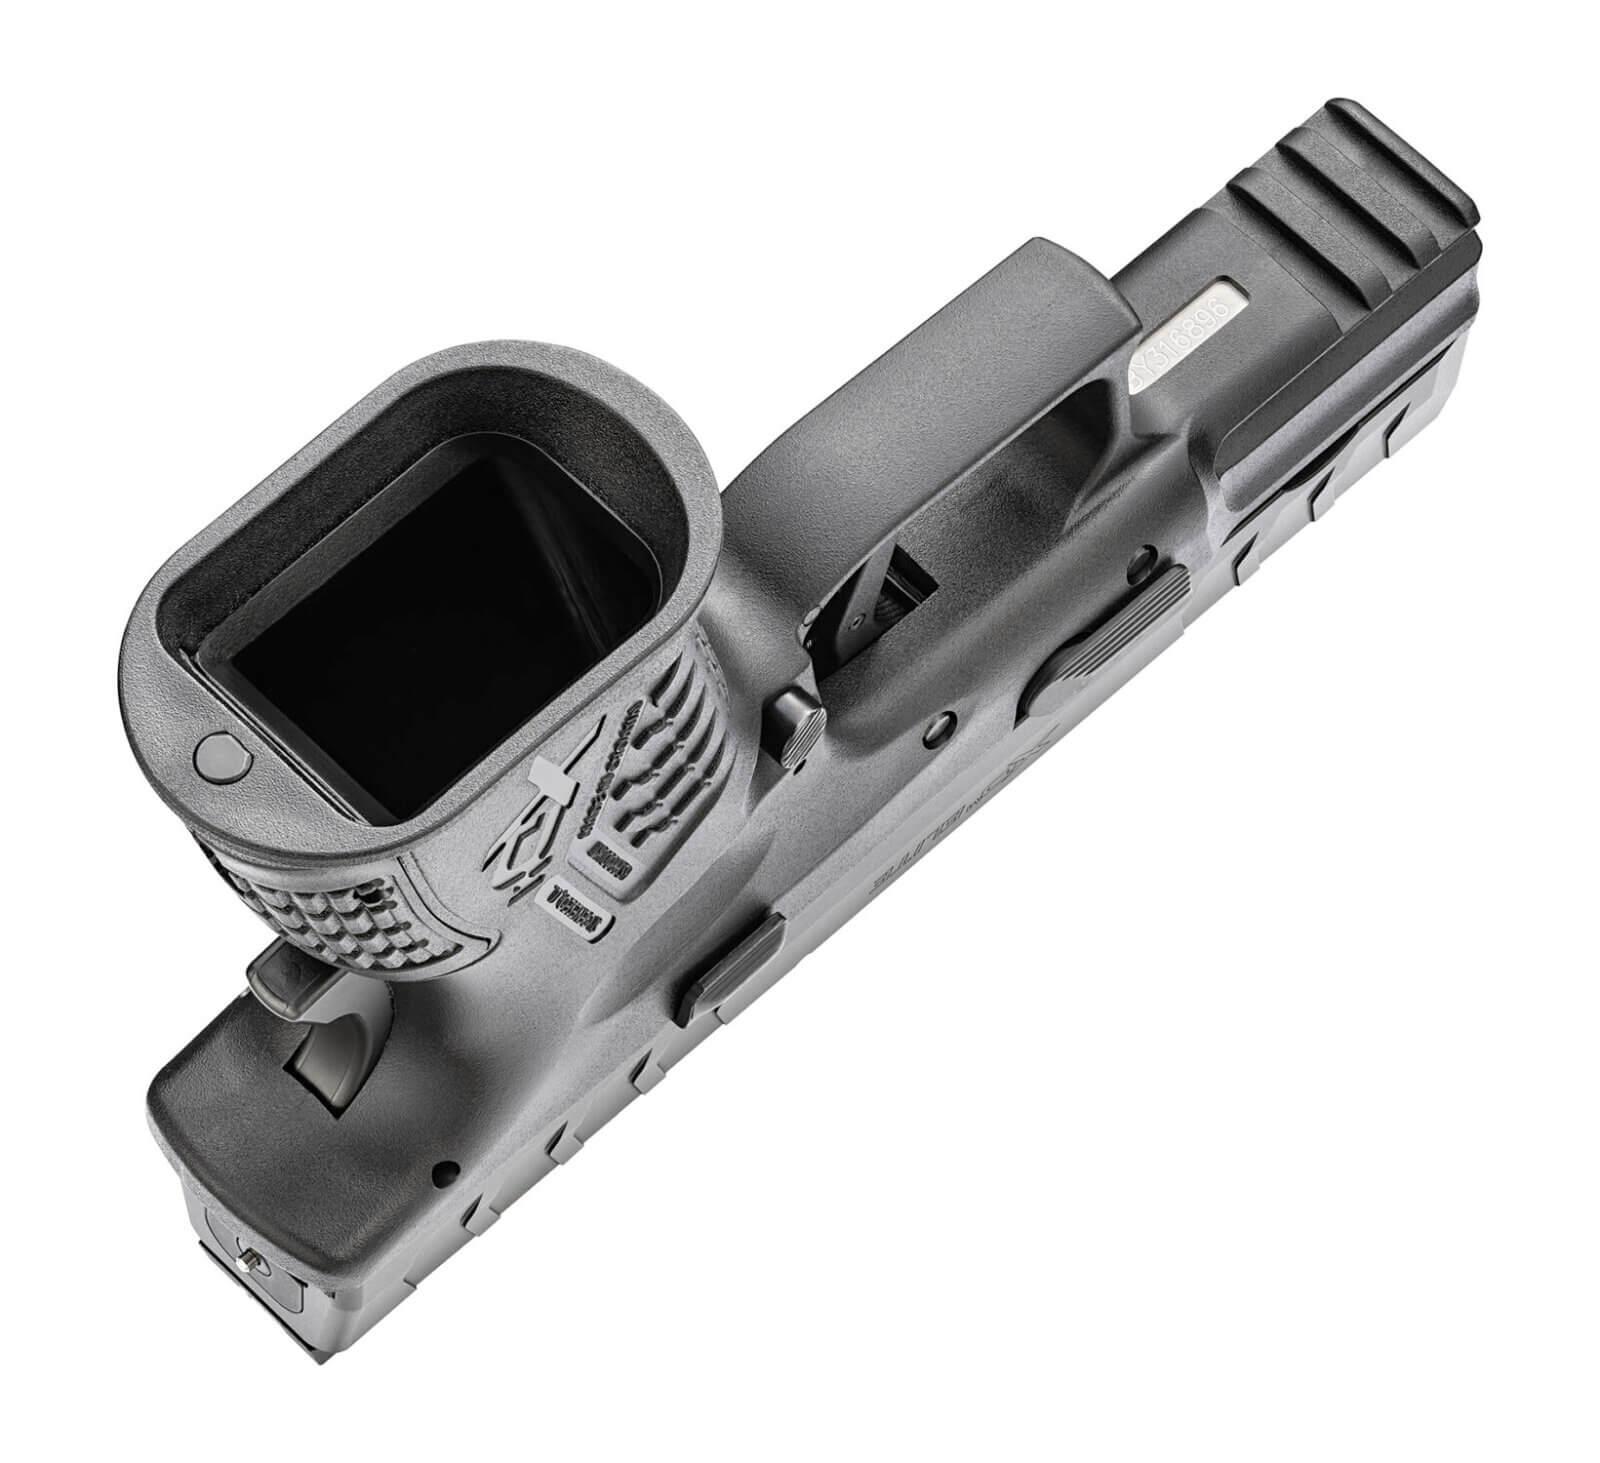 Flared magwell on XD-M Elite pistol